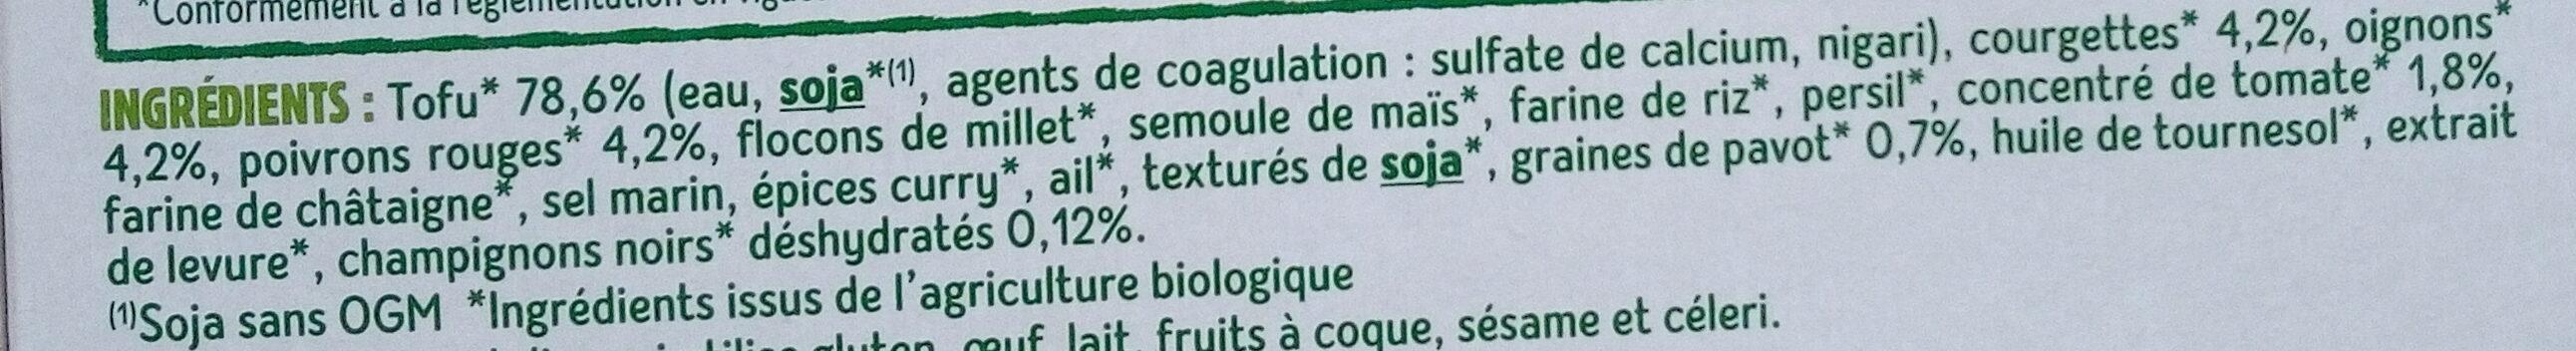 CROQ' SOJA - Ingredients - fr